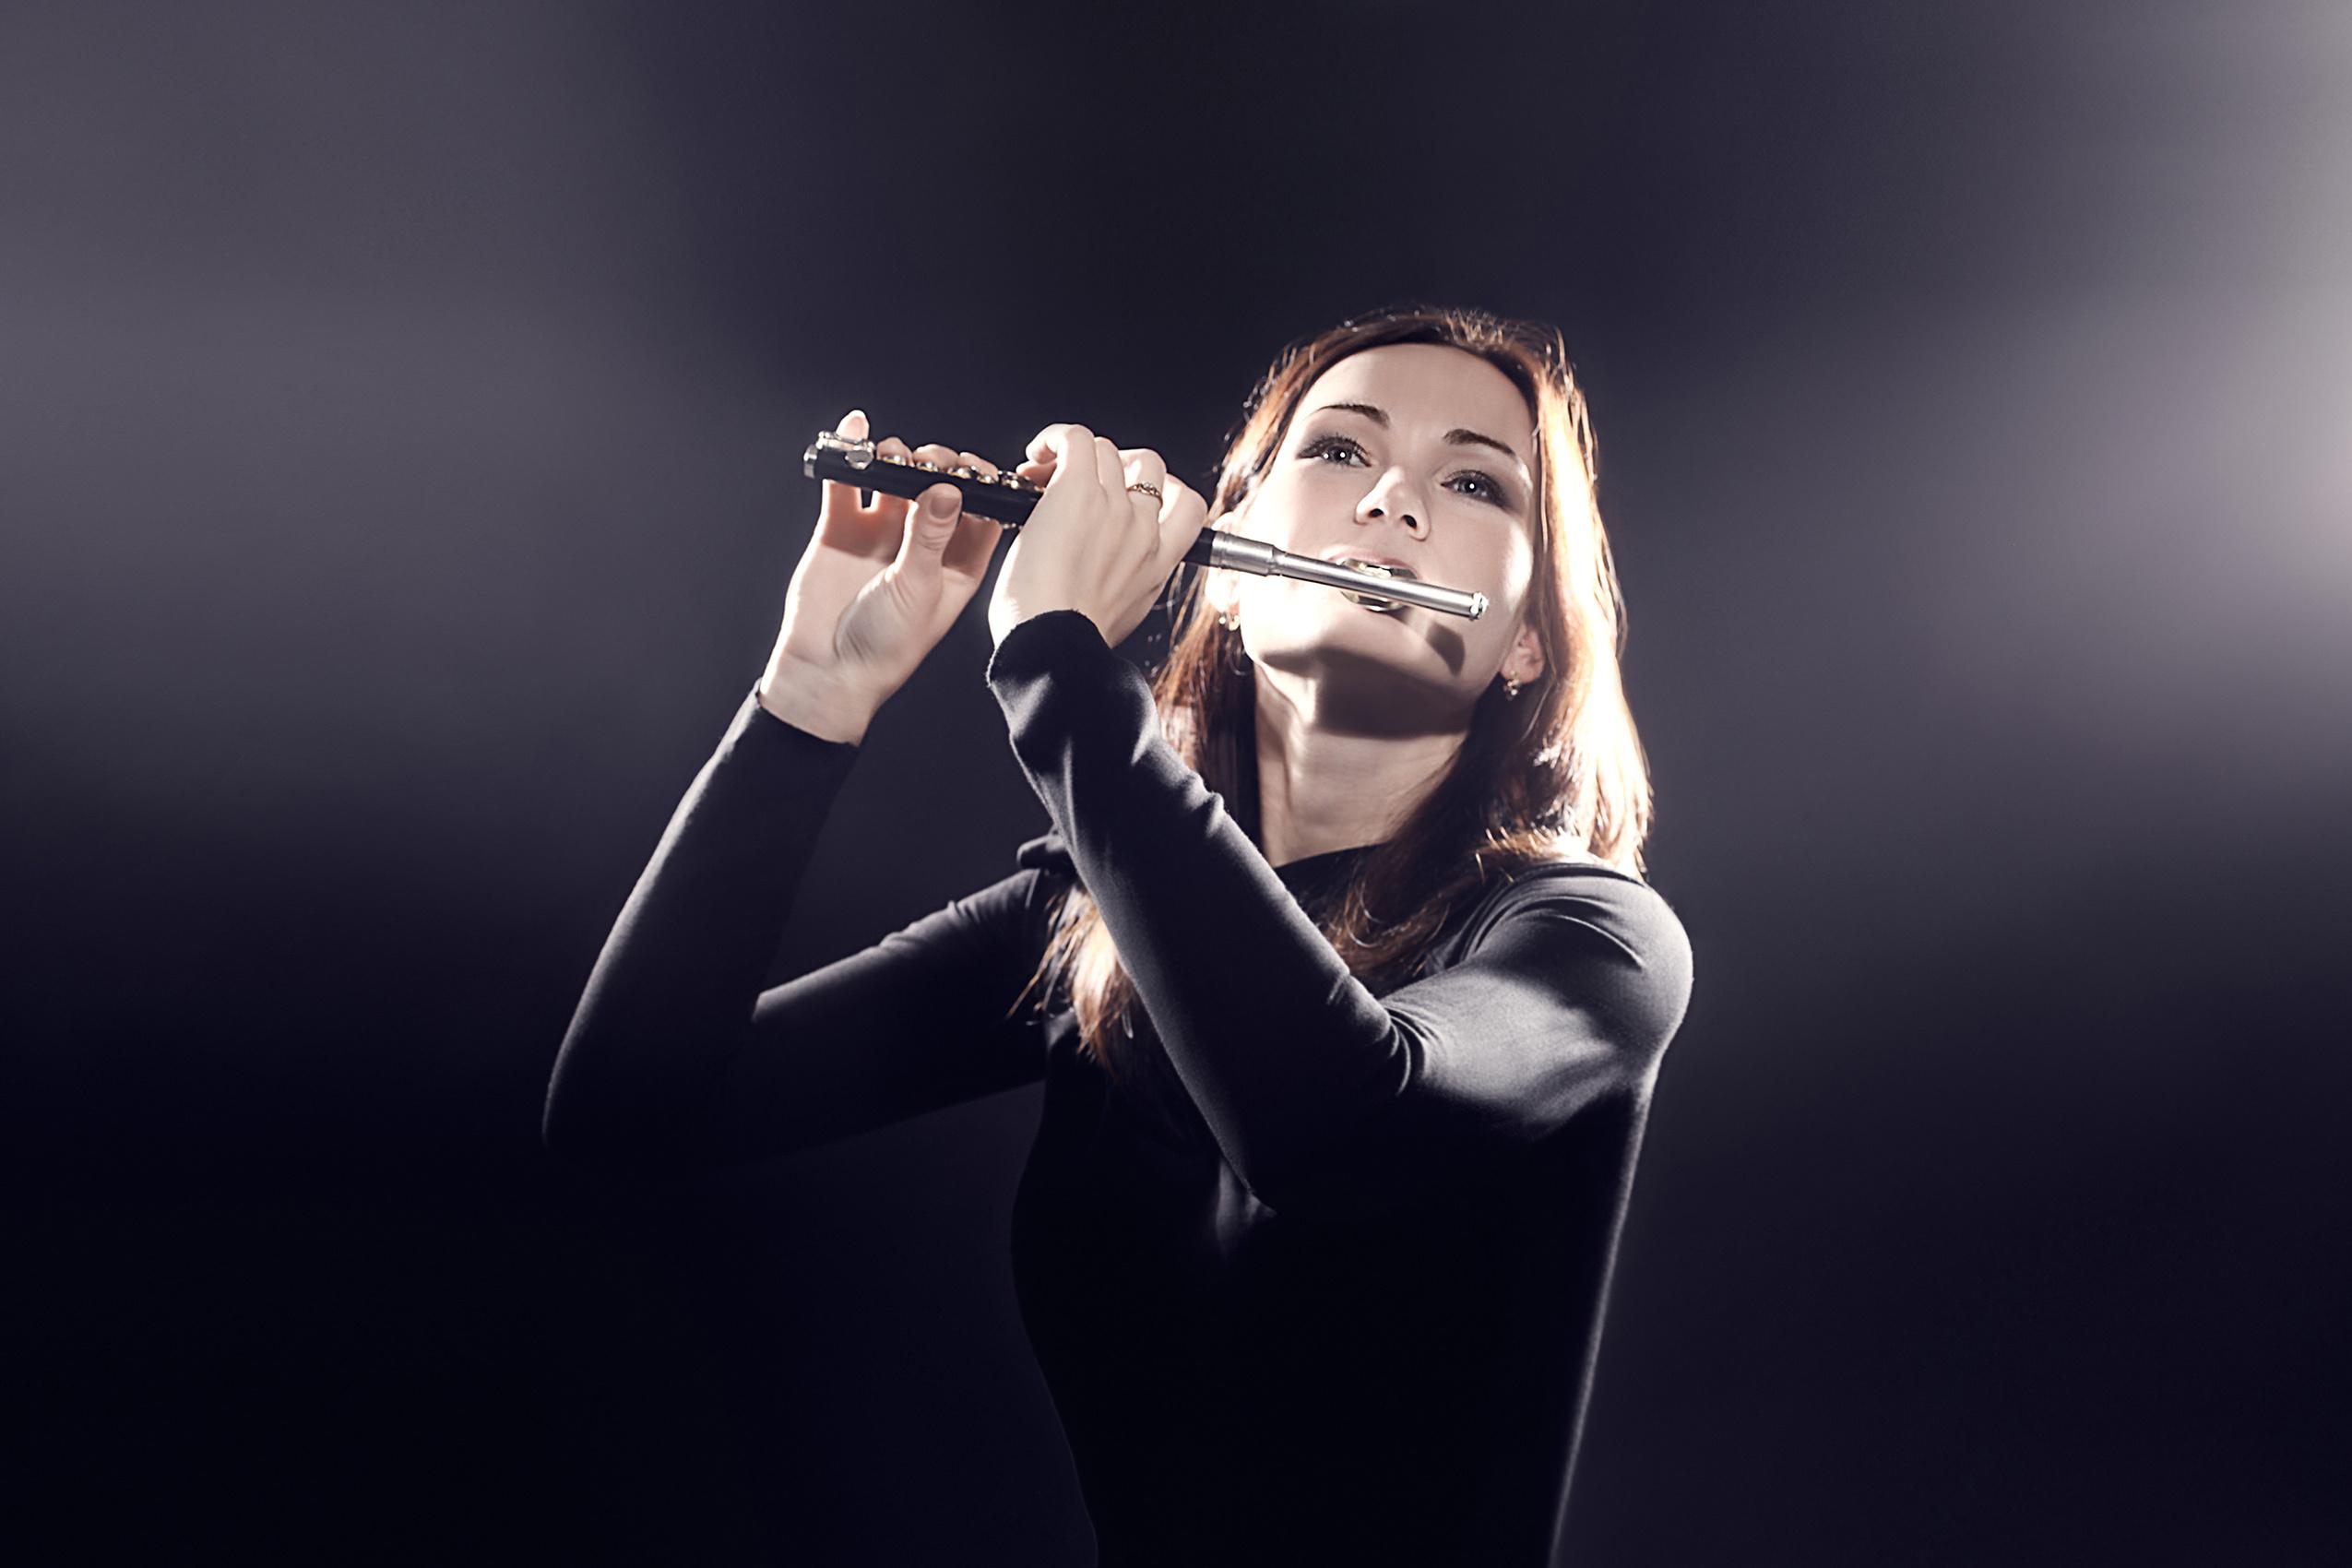 Woman playing piccolo